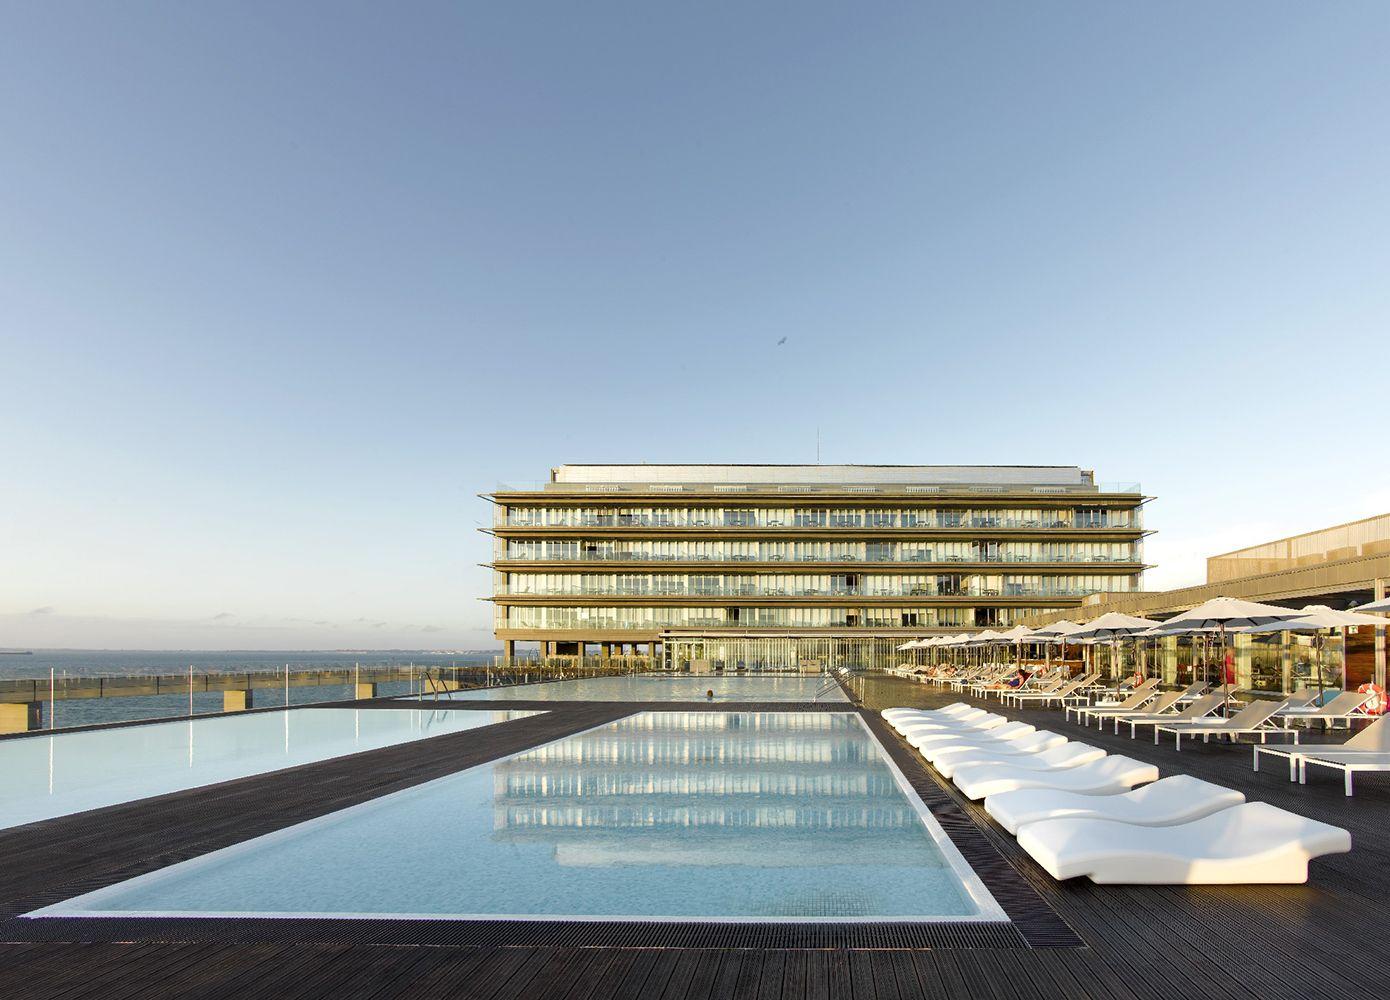 Piscinas Parador Hotel Atlántico Hidroingenia Diseño de